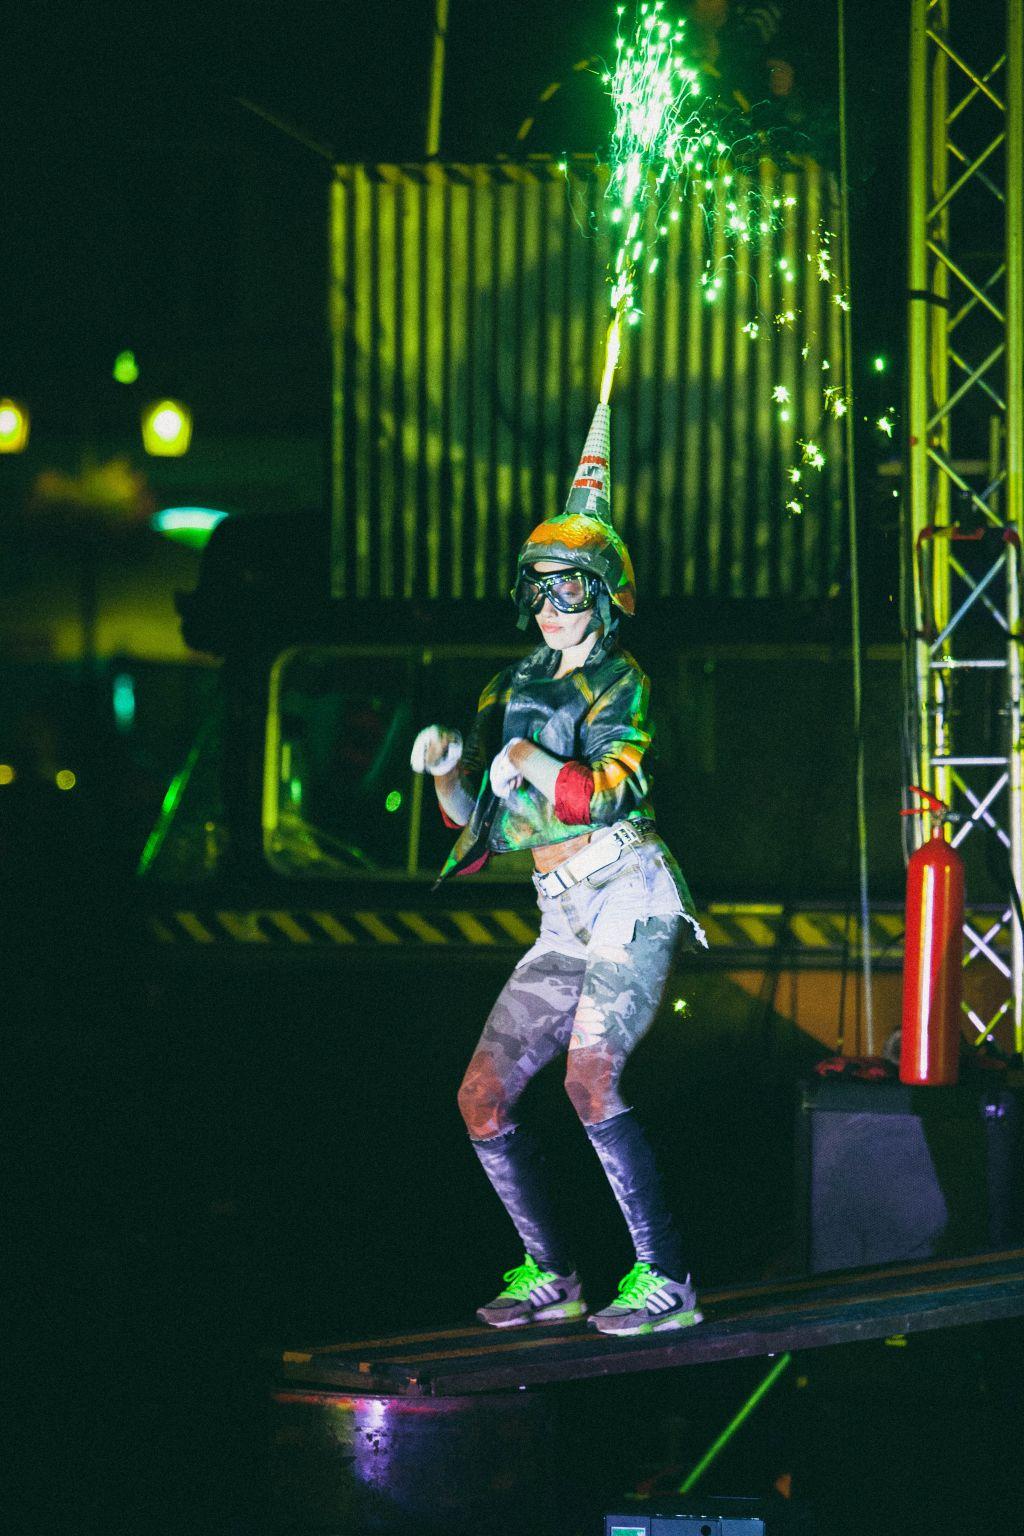 carnaval sztukmistrzów II (29)